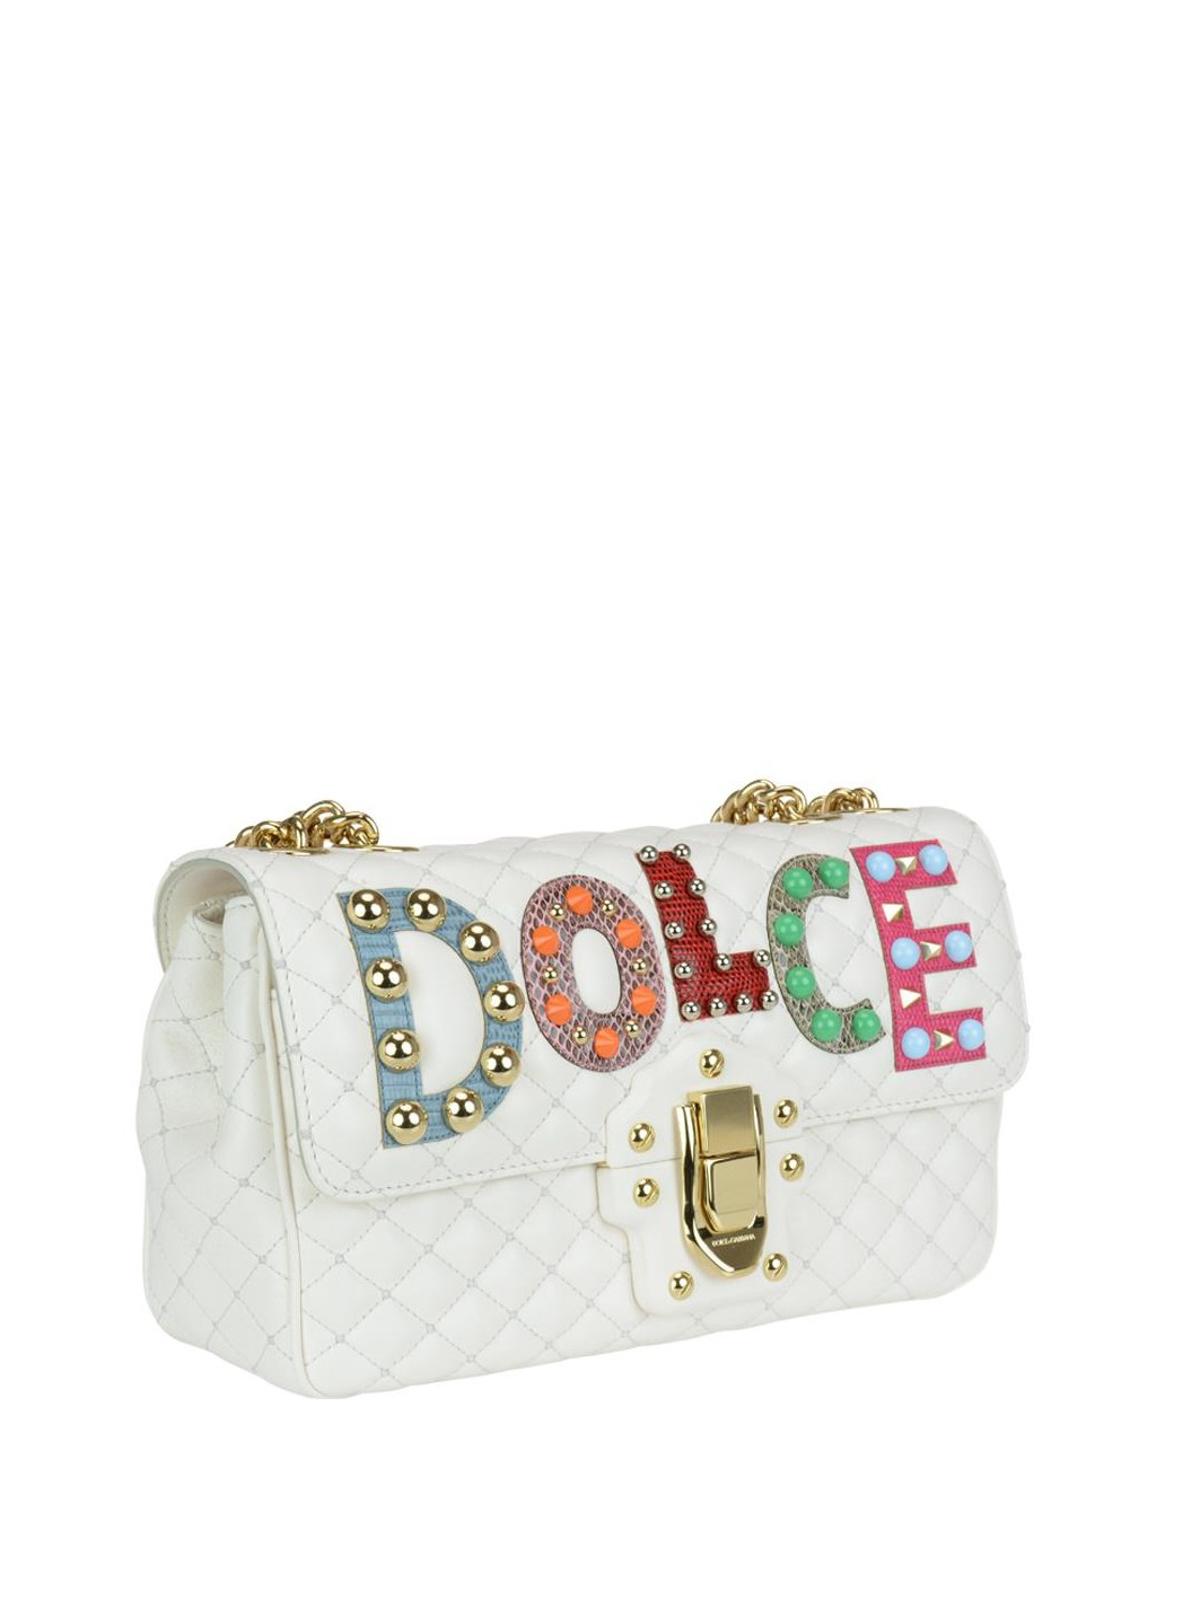 Dolce & Gabbana Lucia white matelasse nappa bag Liwrq